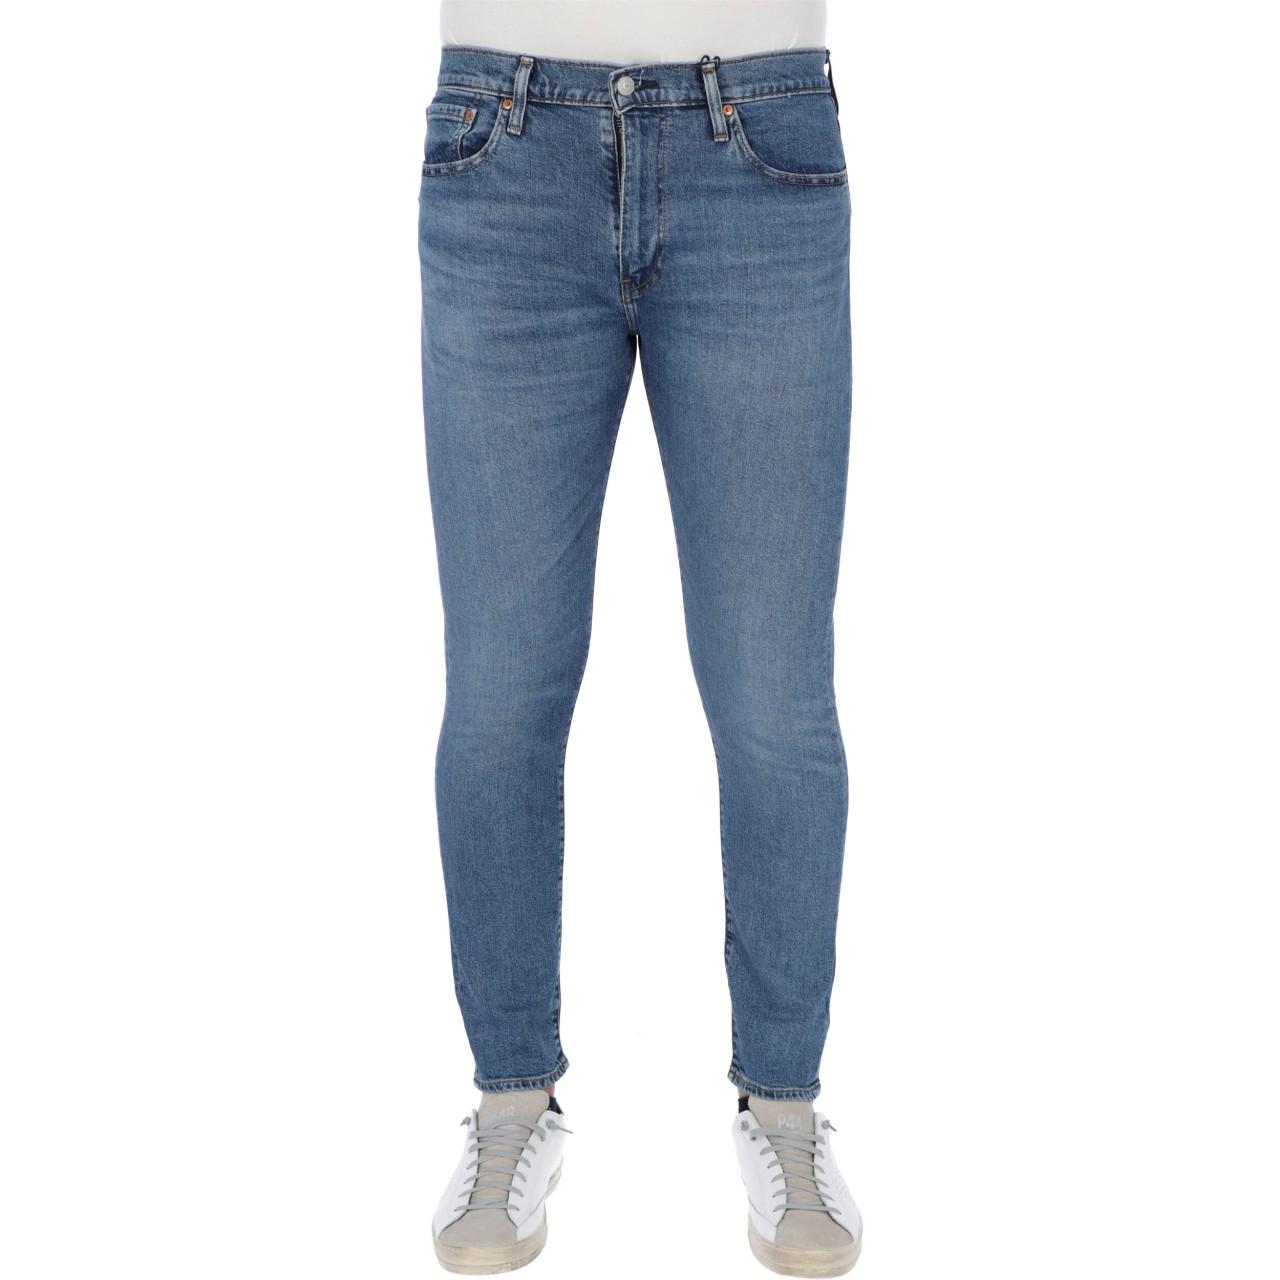 Levi's Uomo Jeans Levi's Uomo 512 Slim Taper L32 Corfu Spanish 8330749P